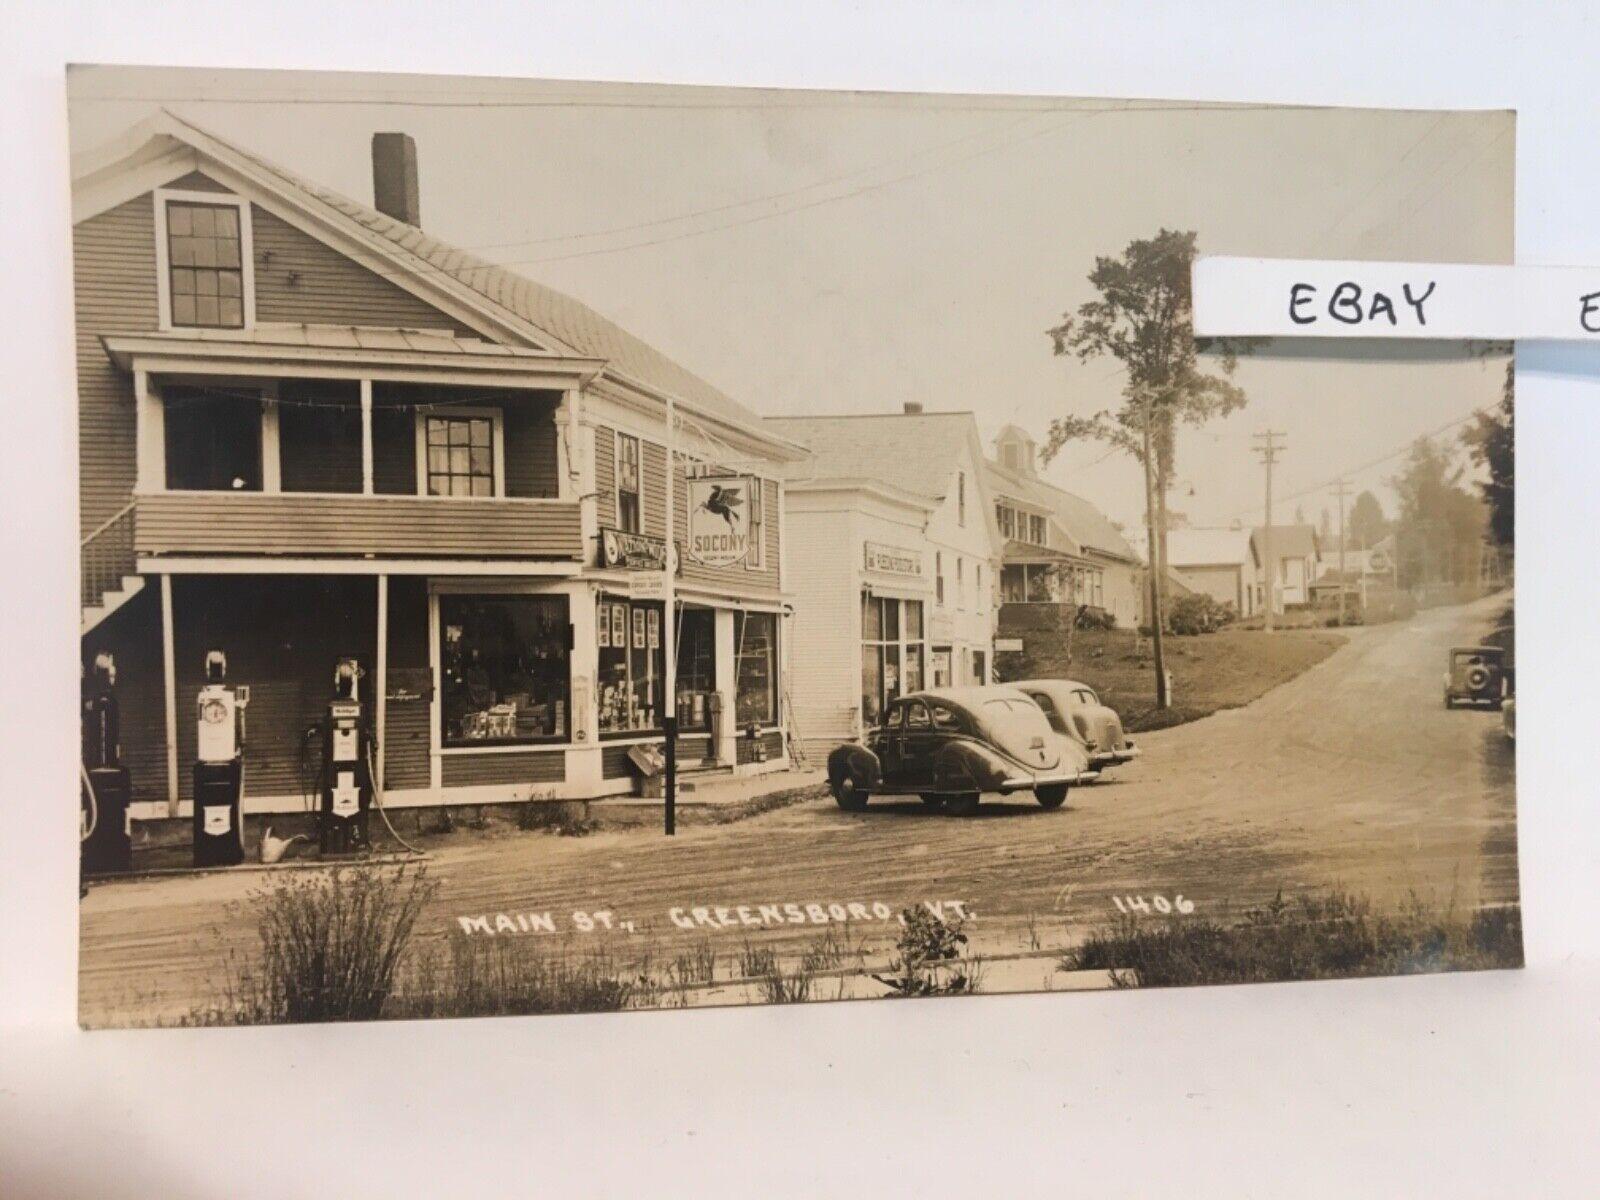 Old Greensboro VT. Main Street Socony Mobil Gas Rare Real Photo RPPC Postcard - $29.95